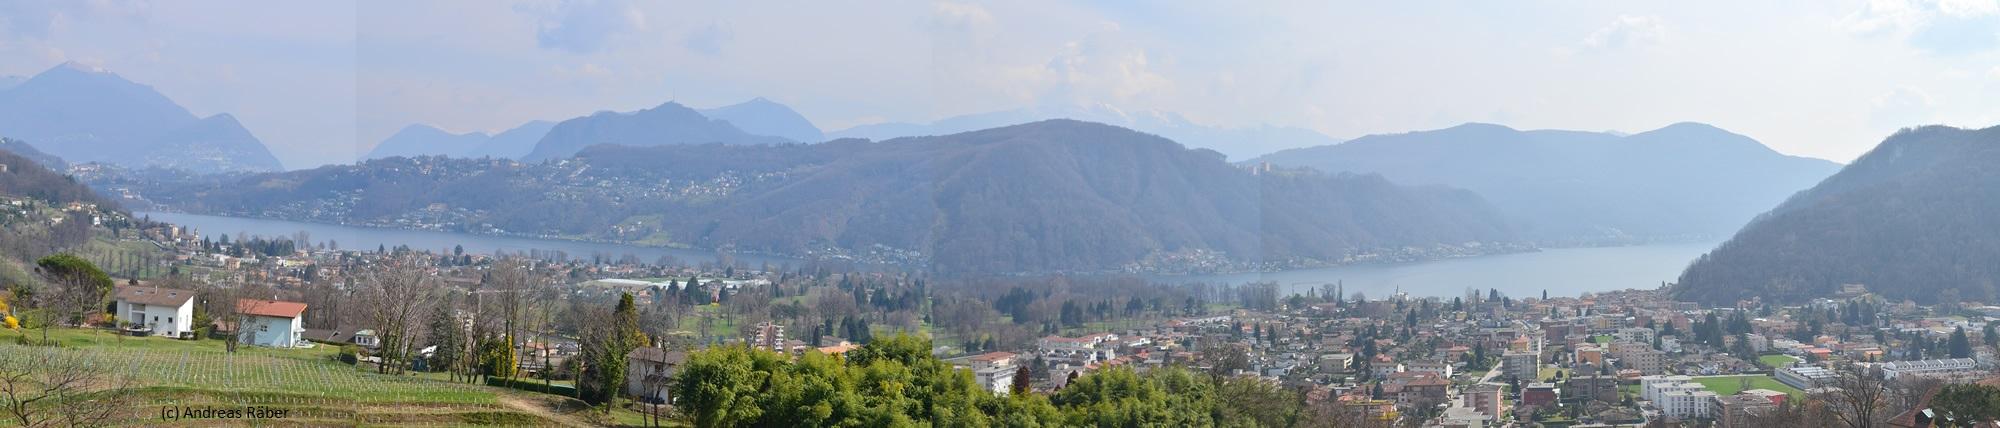 Aussicht vom Hotel Paladina, Pura, Tessin